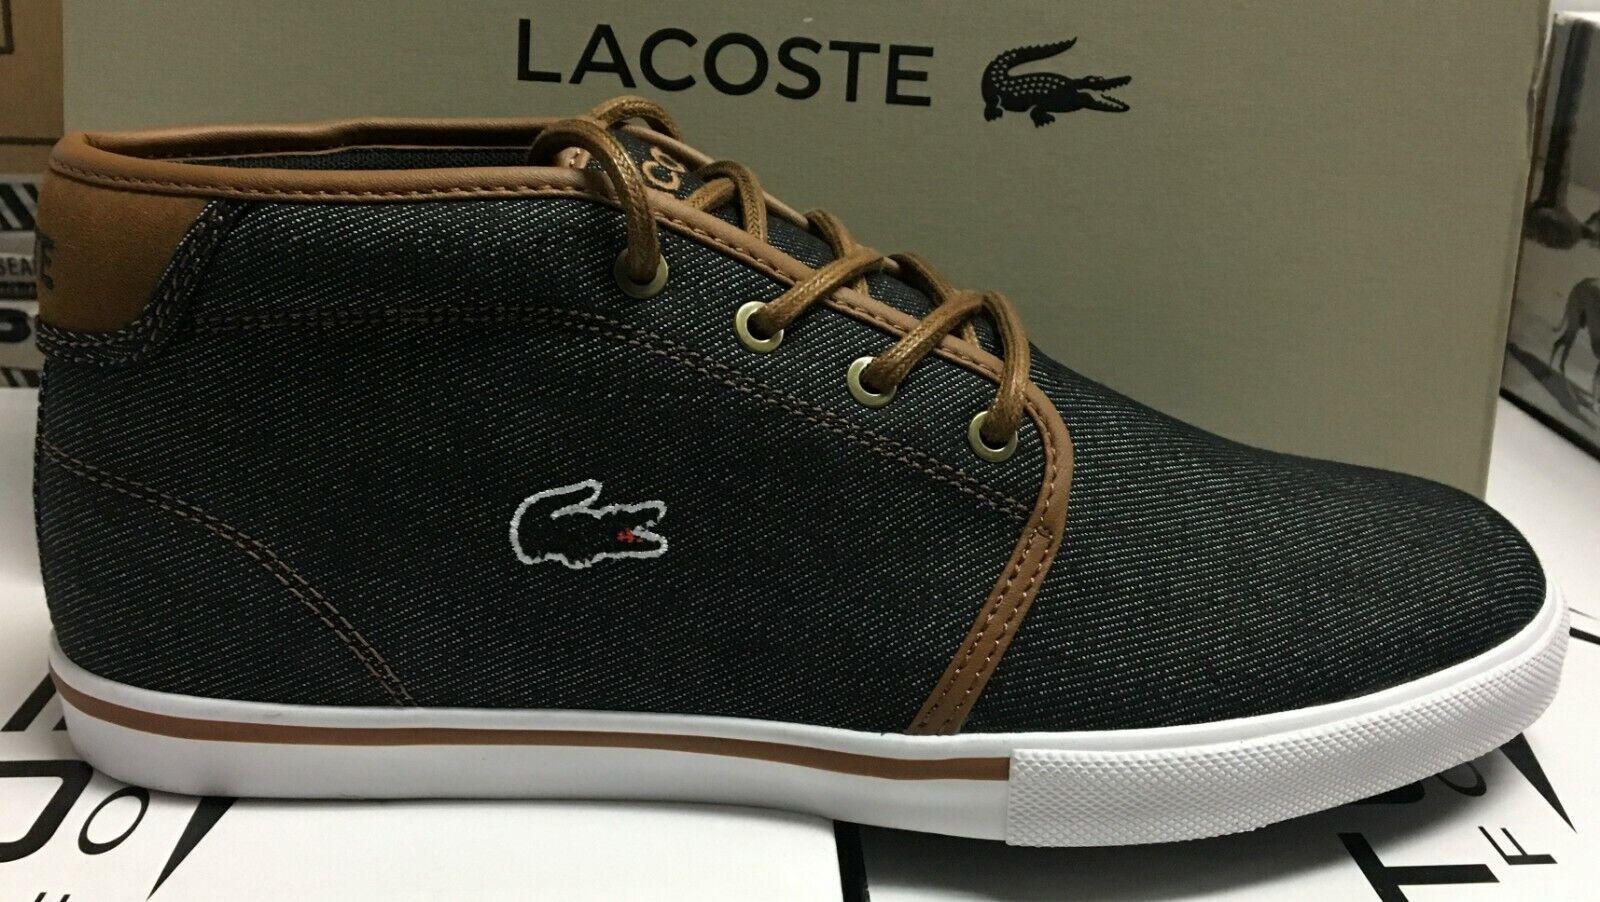 Lacoste Ampthill 317 1 CAM Canvas Men's Casual Sneakers Black 7-34CAM0001094  L